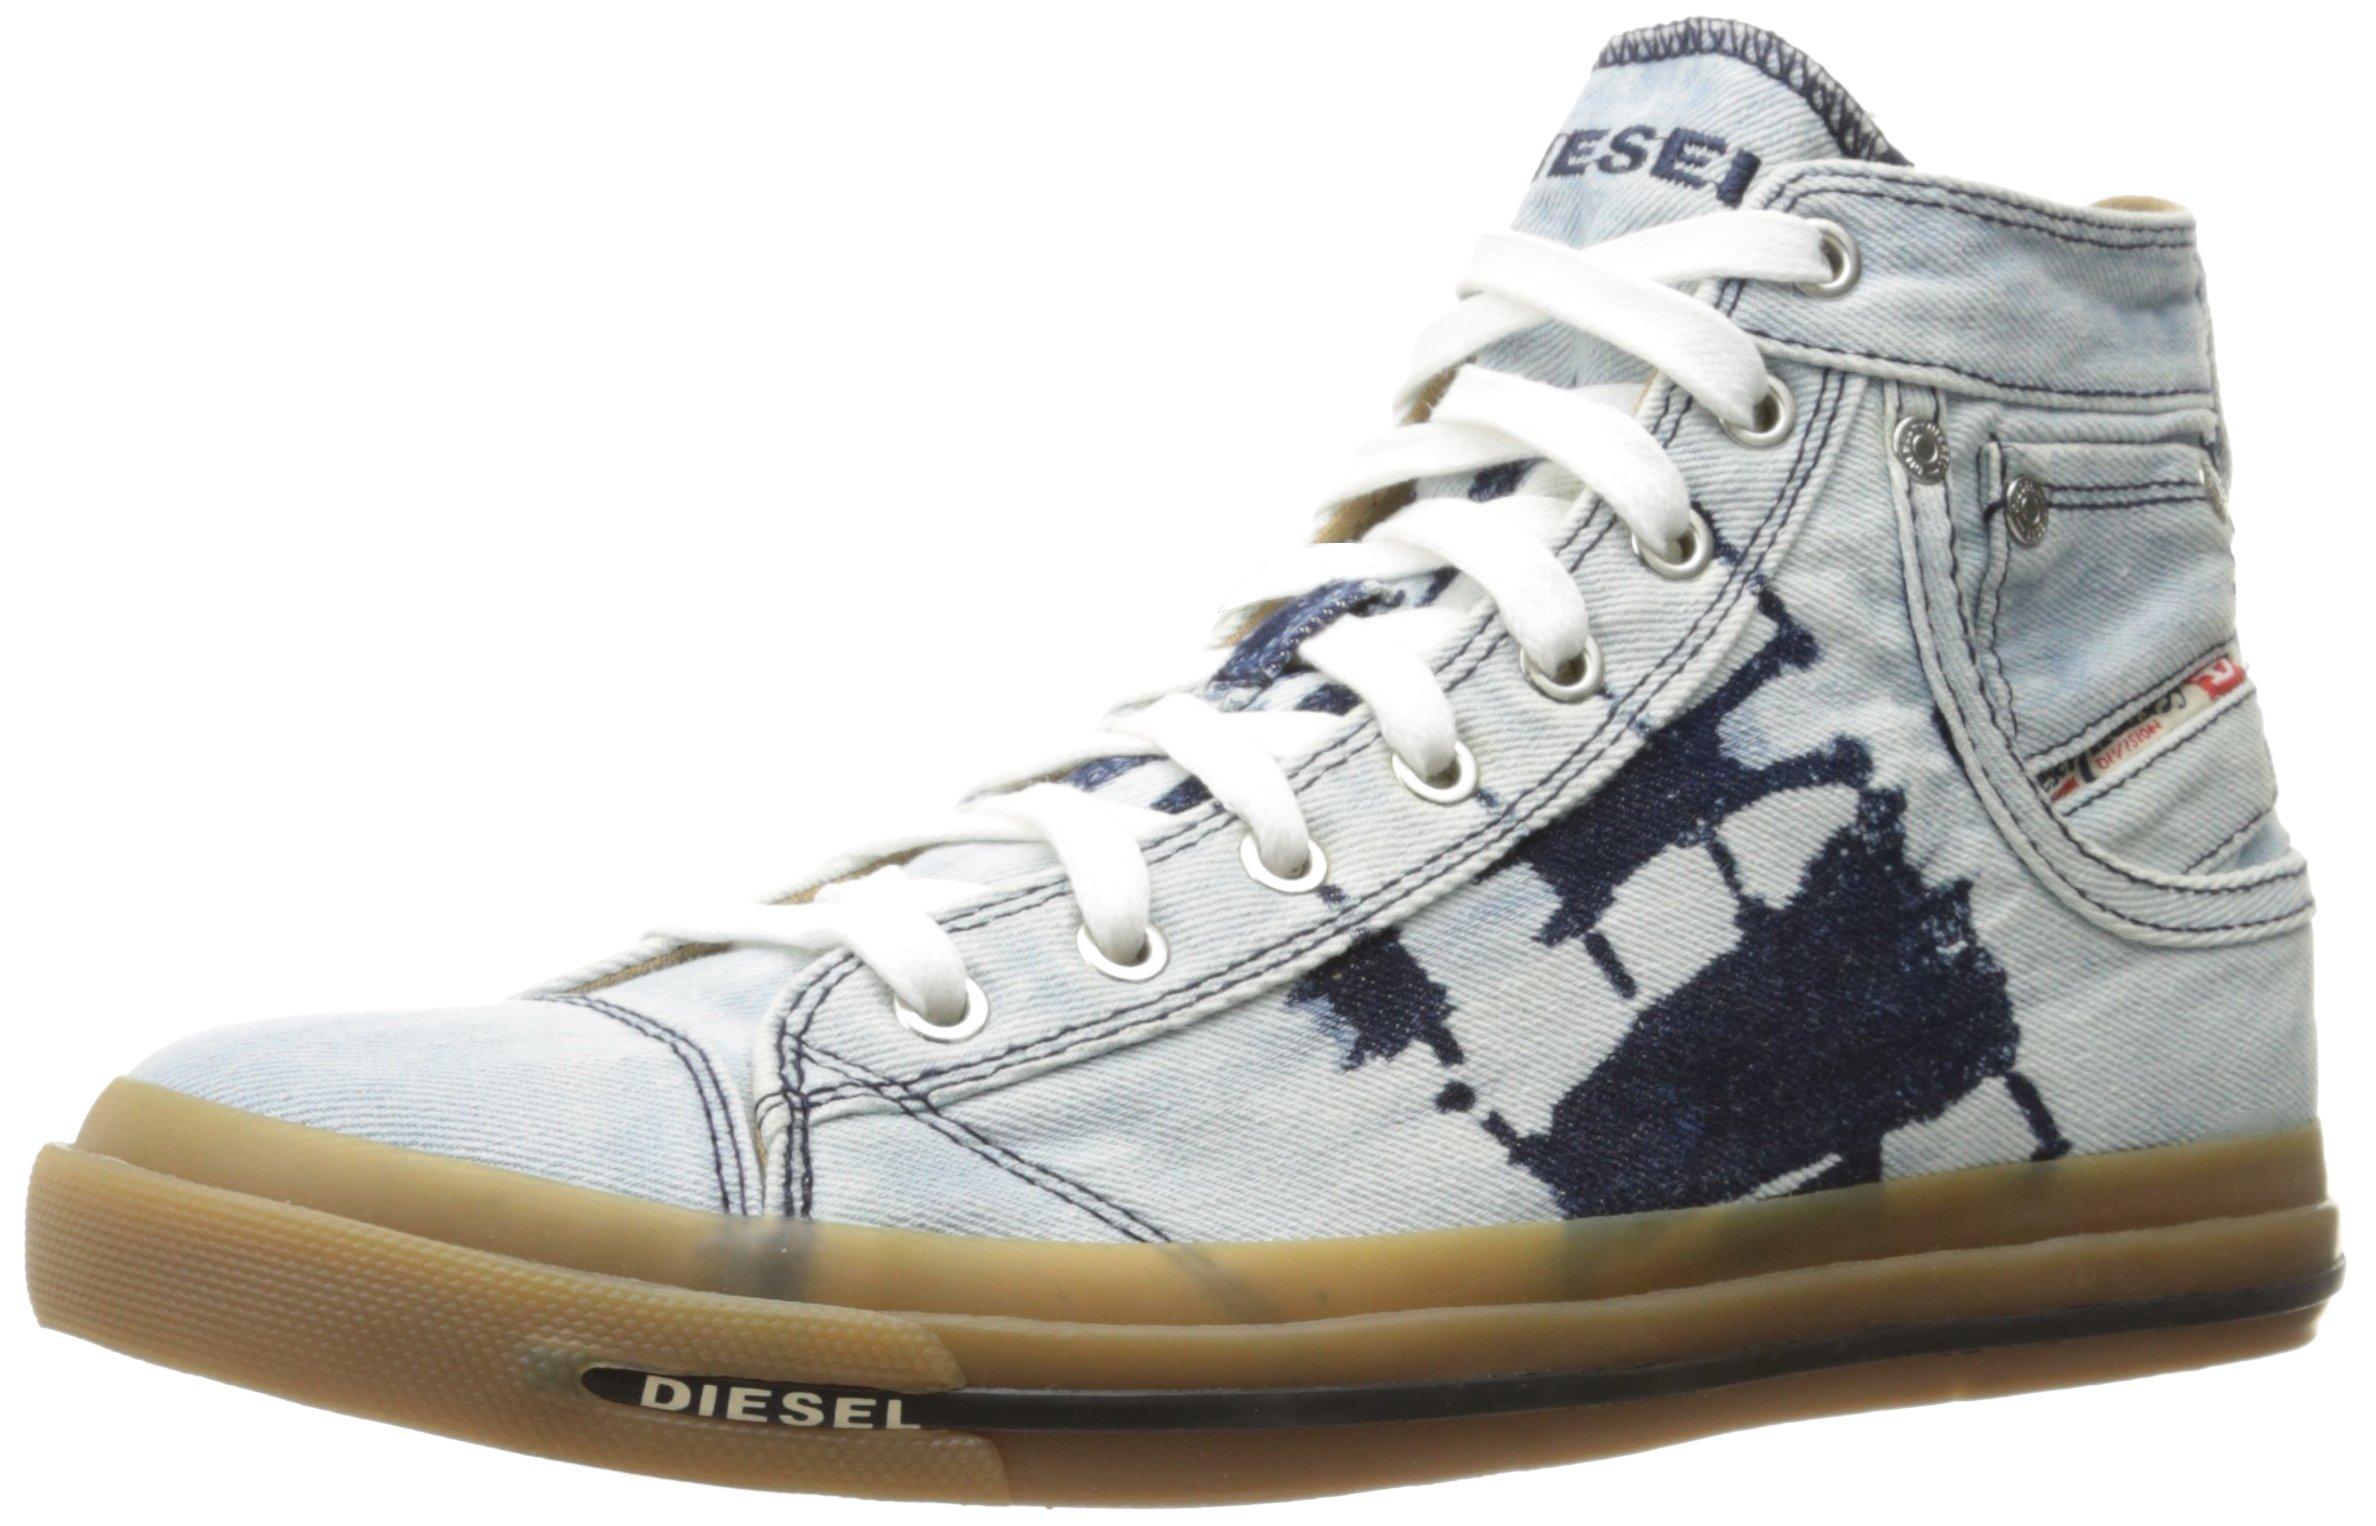 Diesel Men's Magnete Exposure I Fashion Sneaker, Indigo, 8 M US